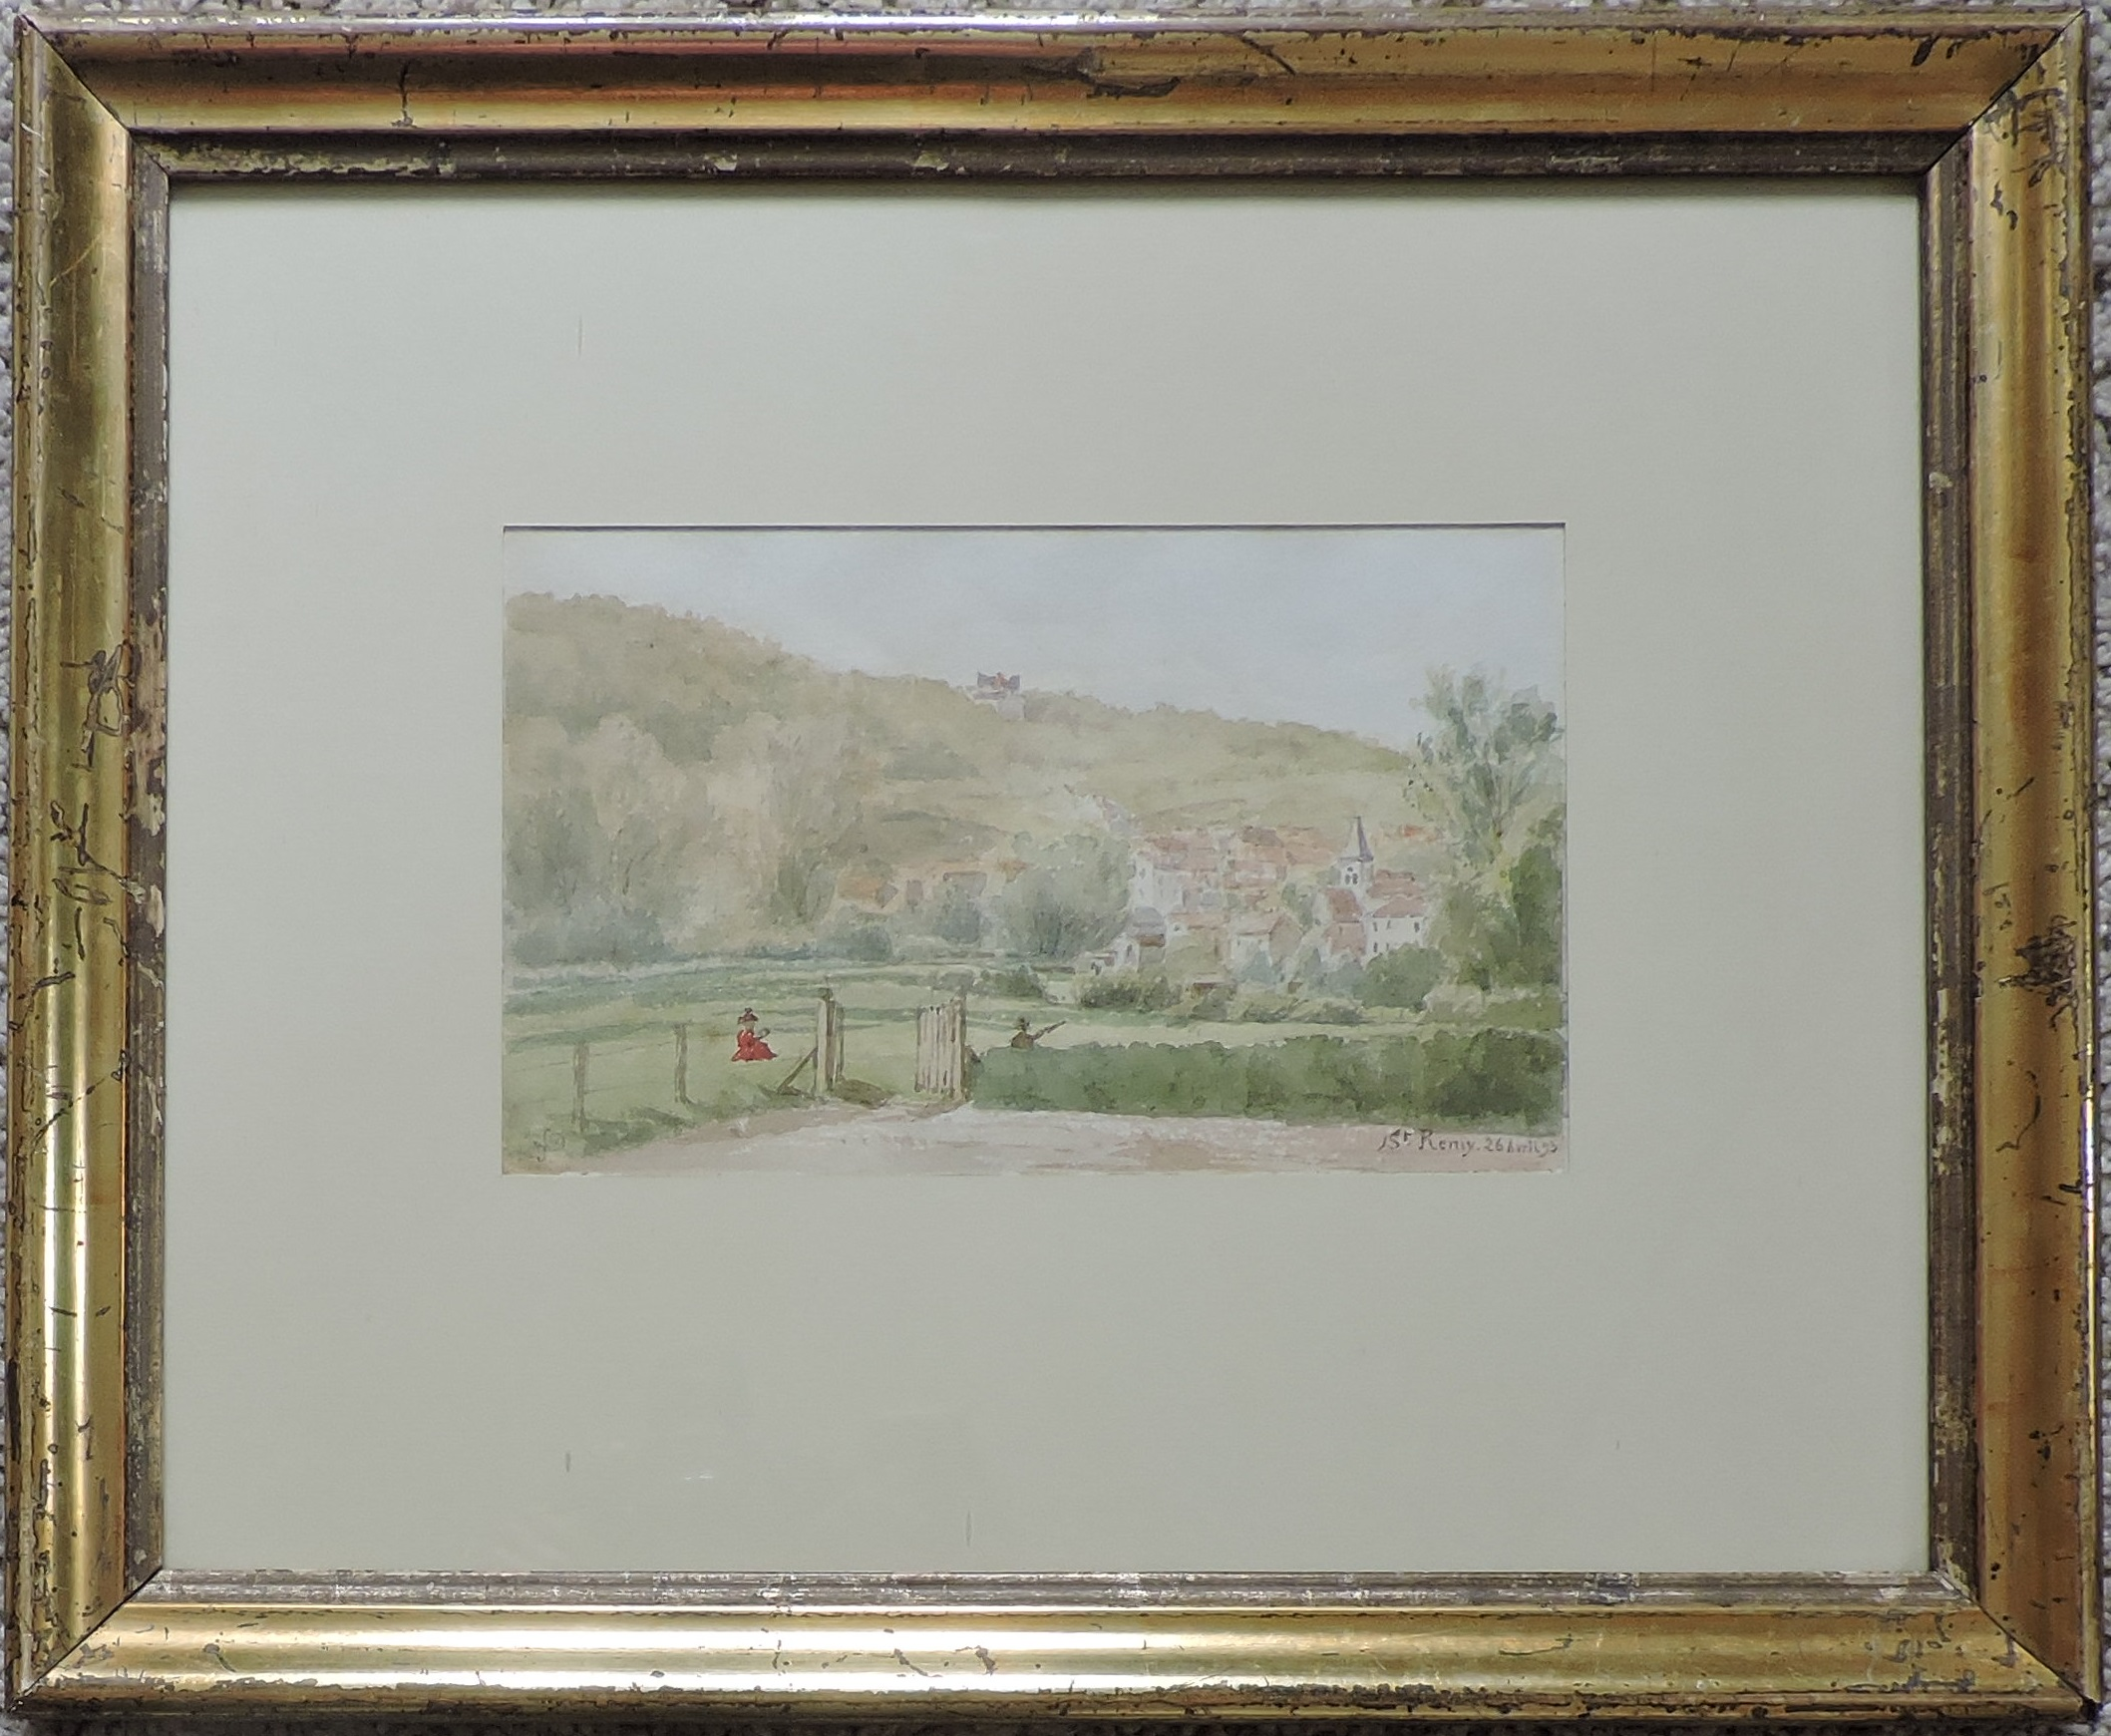 Saint-Rémy-lès-Chevreuse